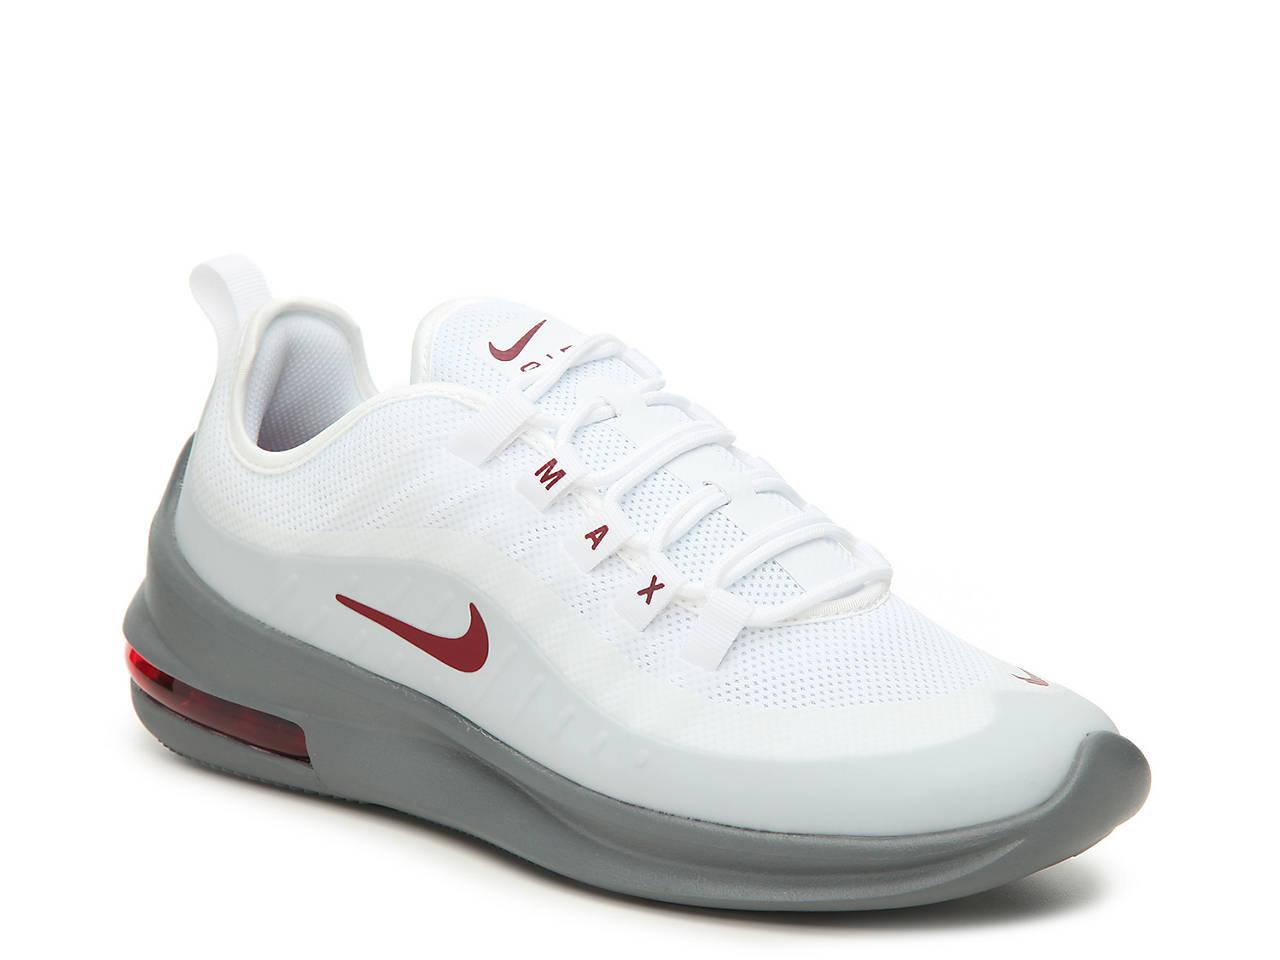 nike air max axis sneaker men 39 s men 39 s shoes dsw. Black Bedroom Furniture Sets. Home Design Ideas